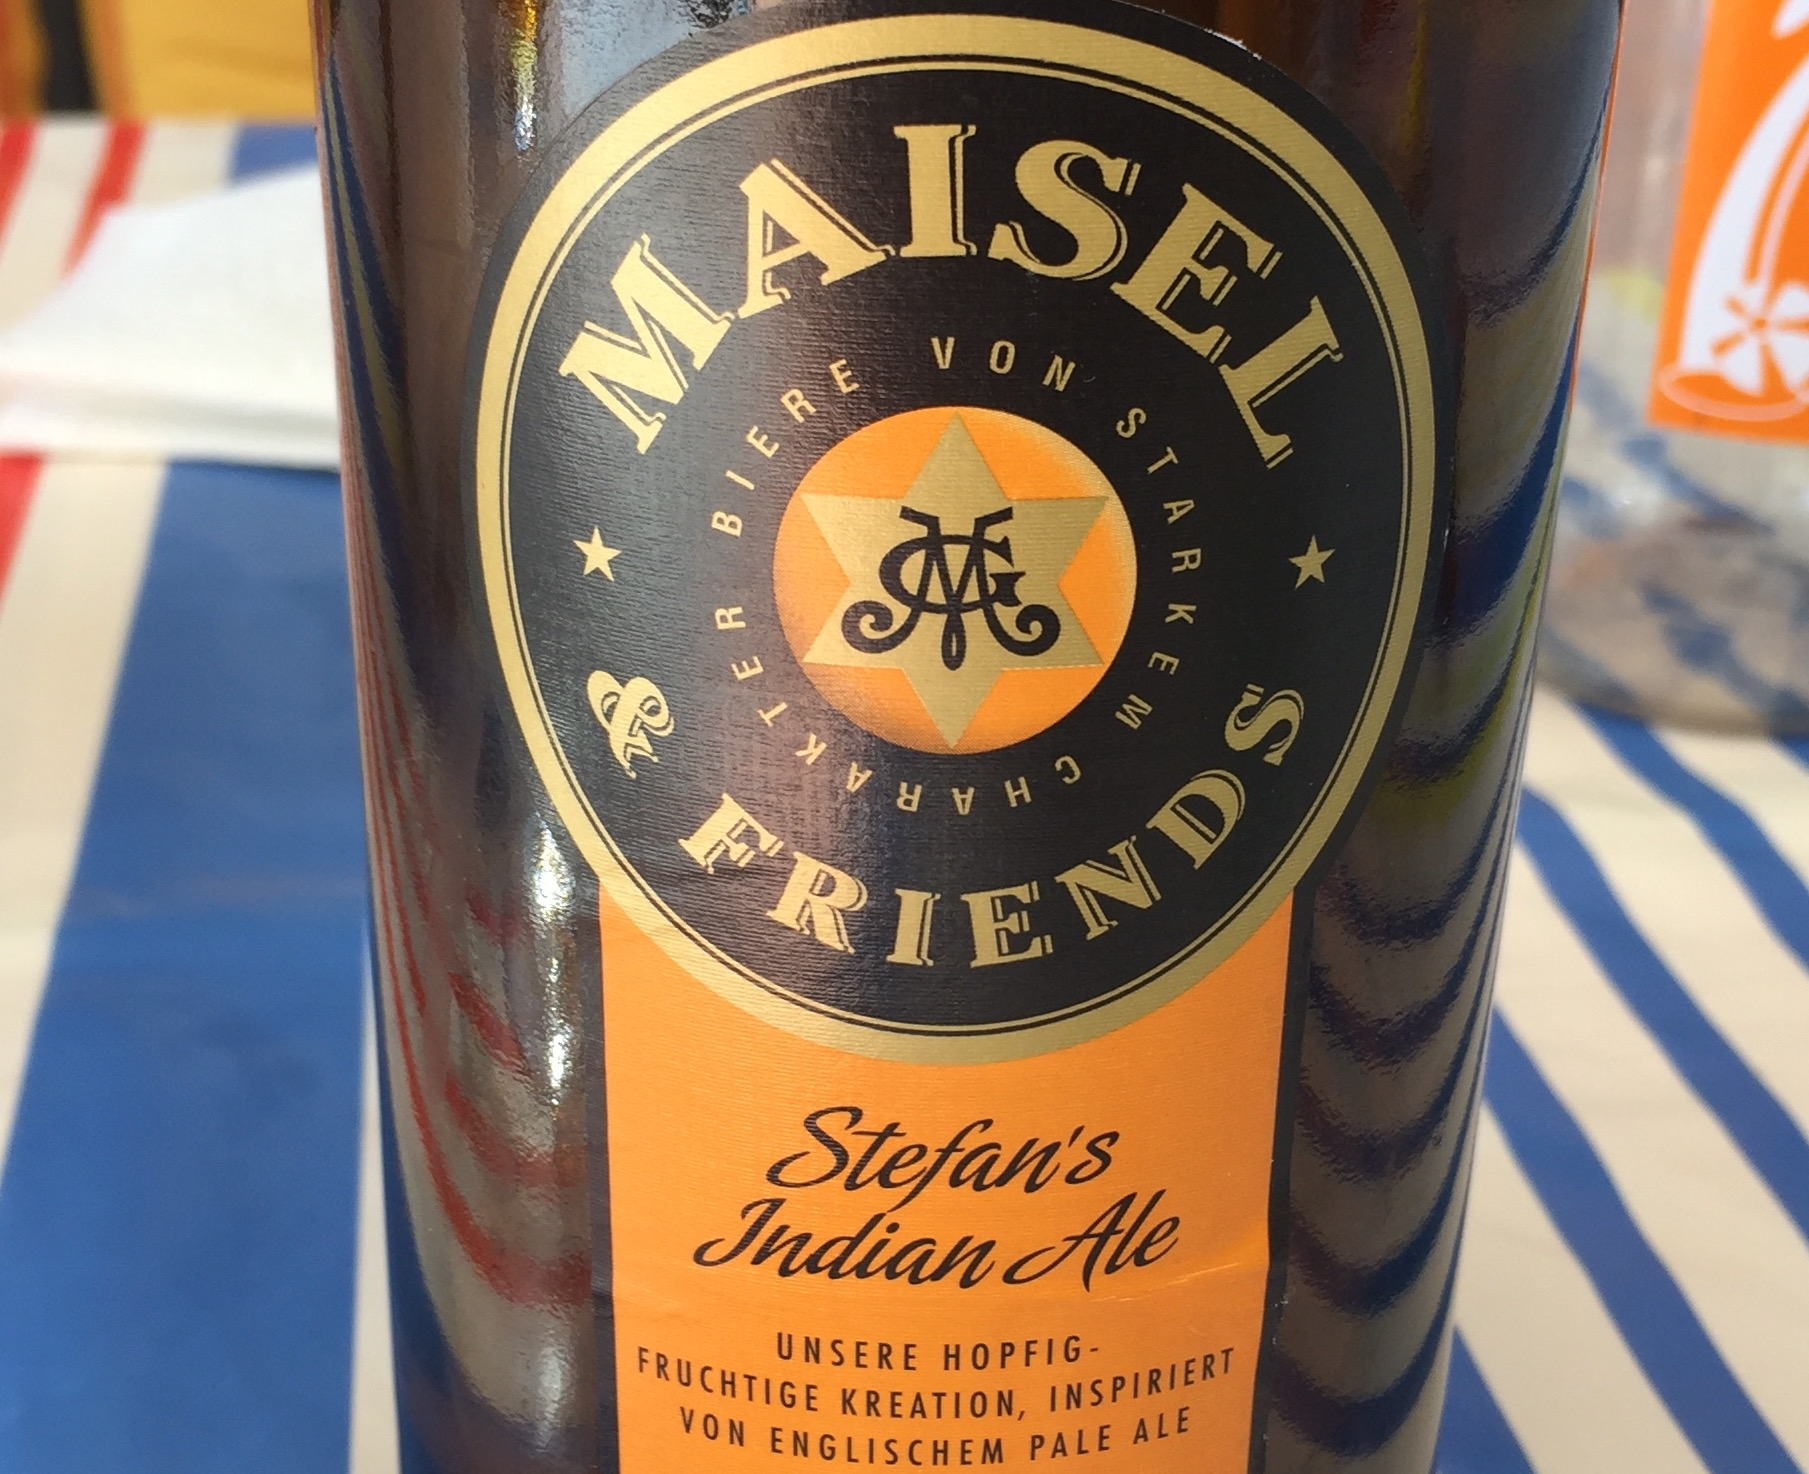 Maisel & Friends - Stefan's Indian Ale